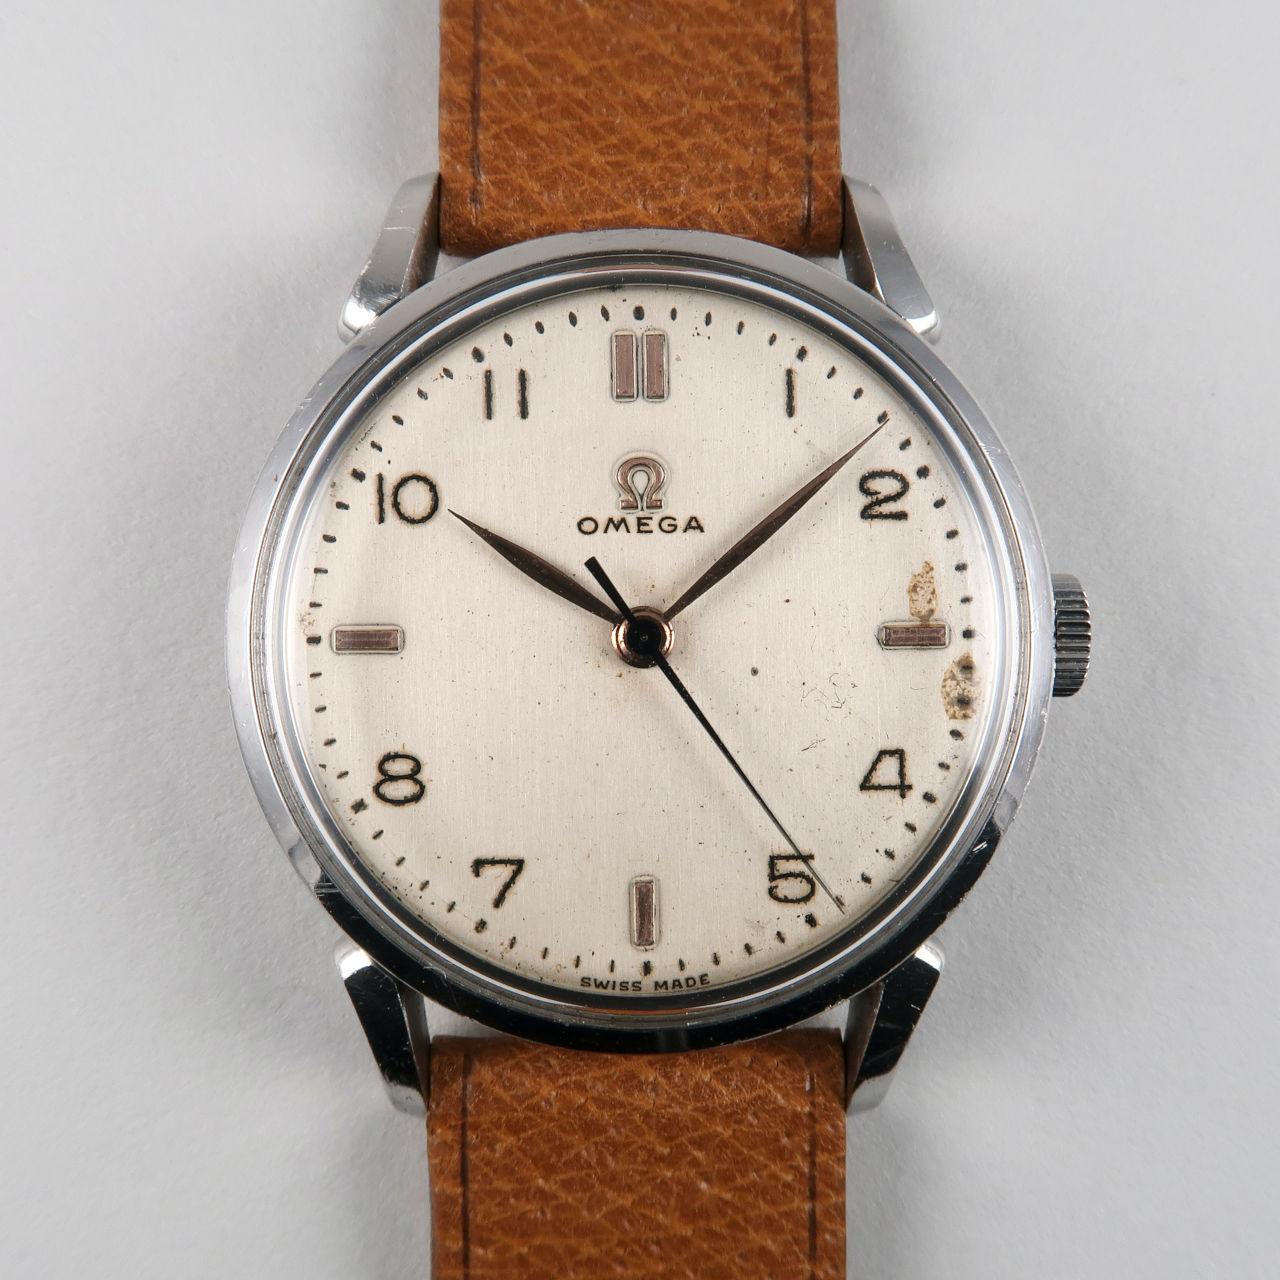 Omega Ref. 2613 -2 circa 1949   steel manually wound wristwatch